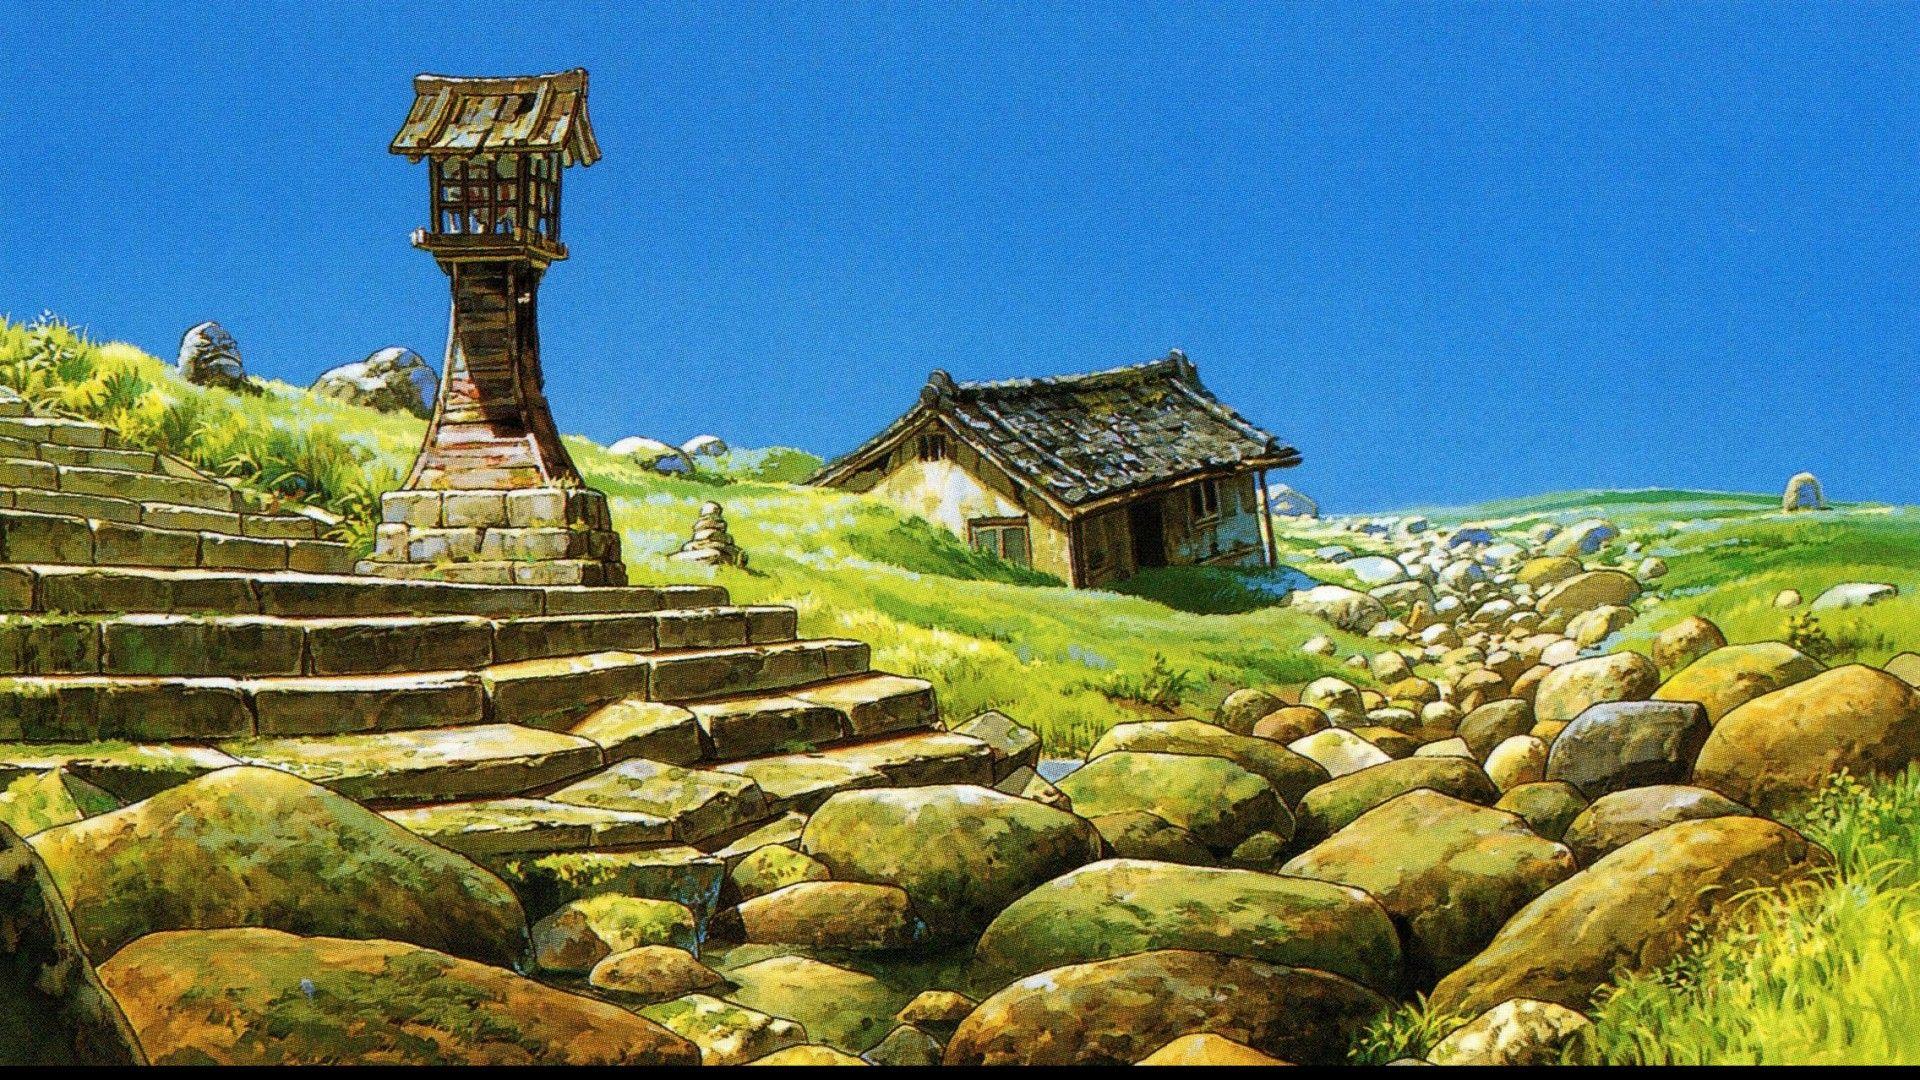 Studio Ghibli Wallpaper HD | PixelsTalk.Net